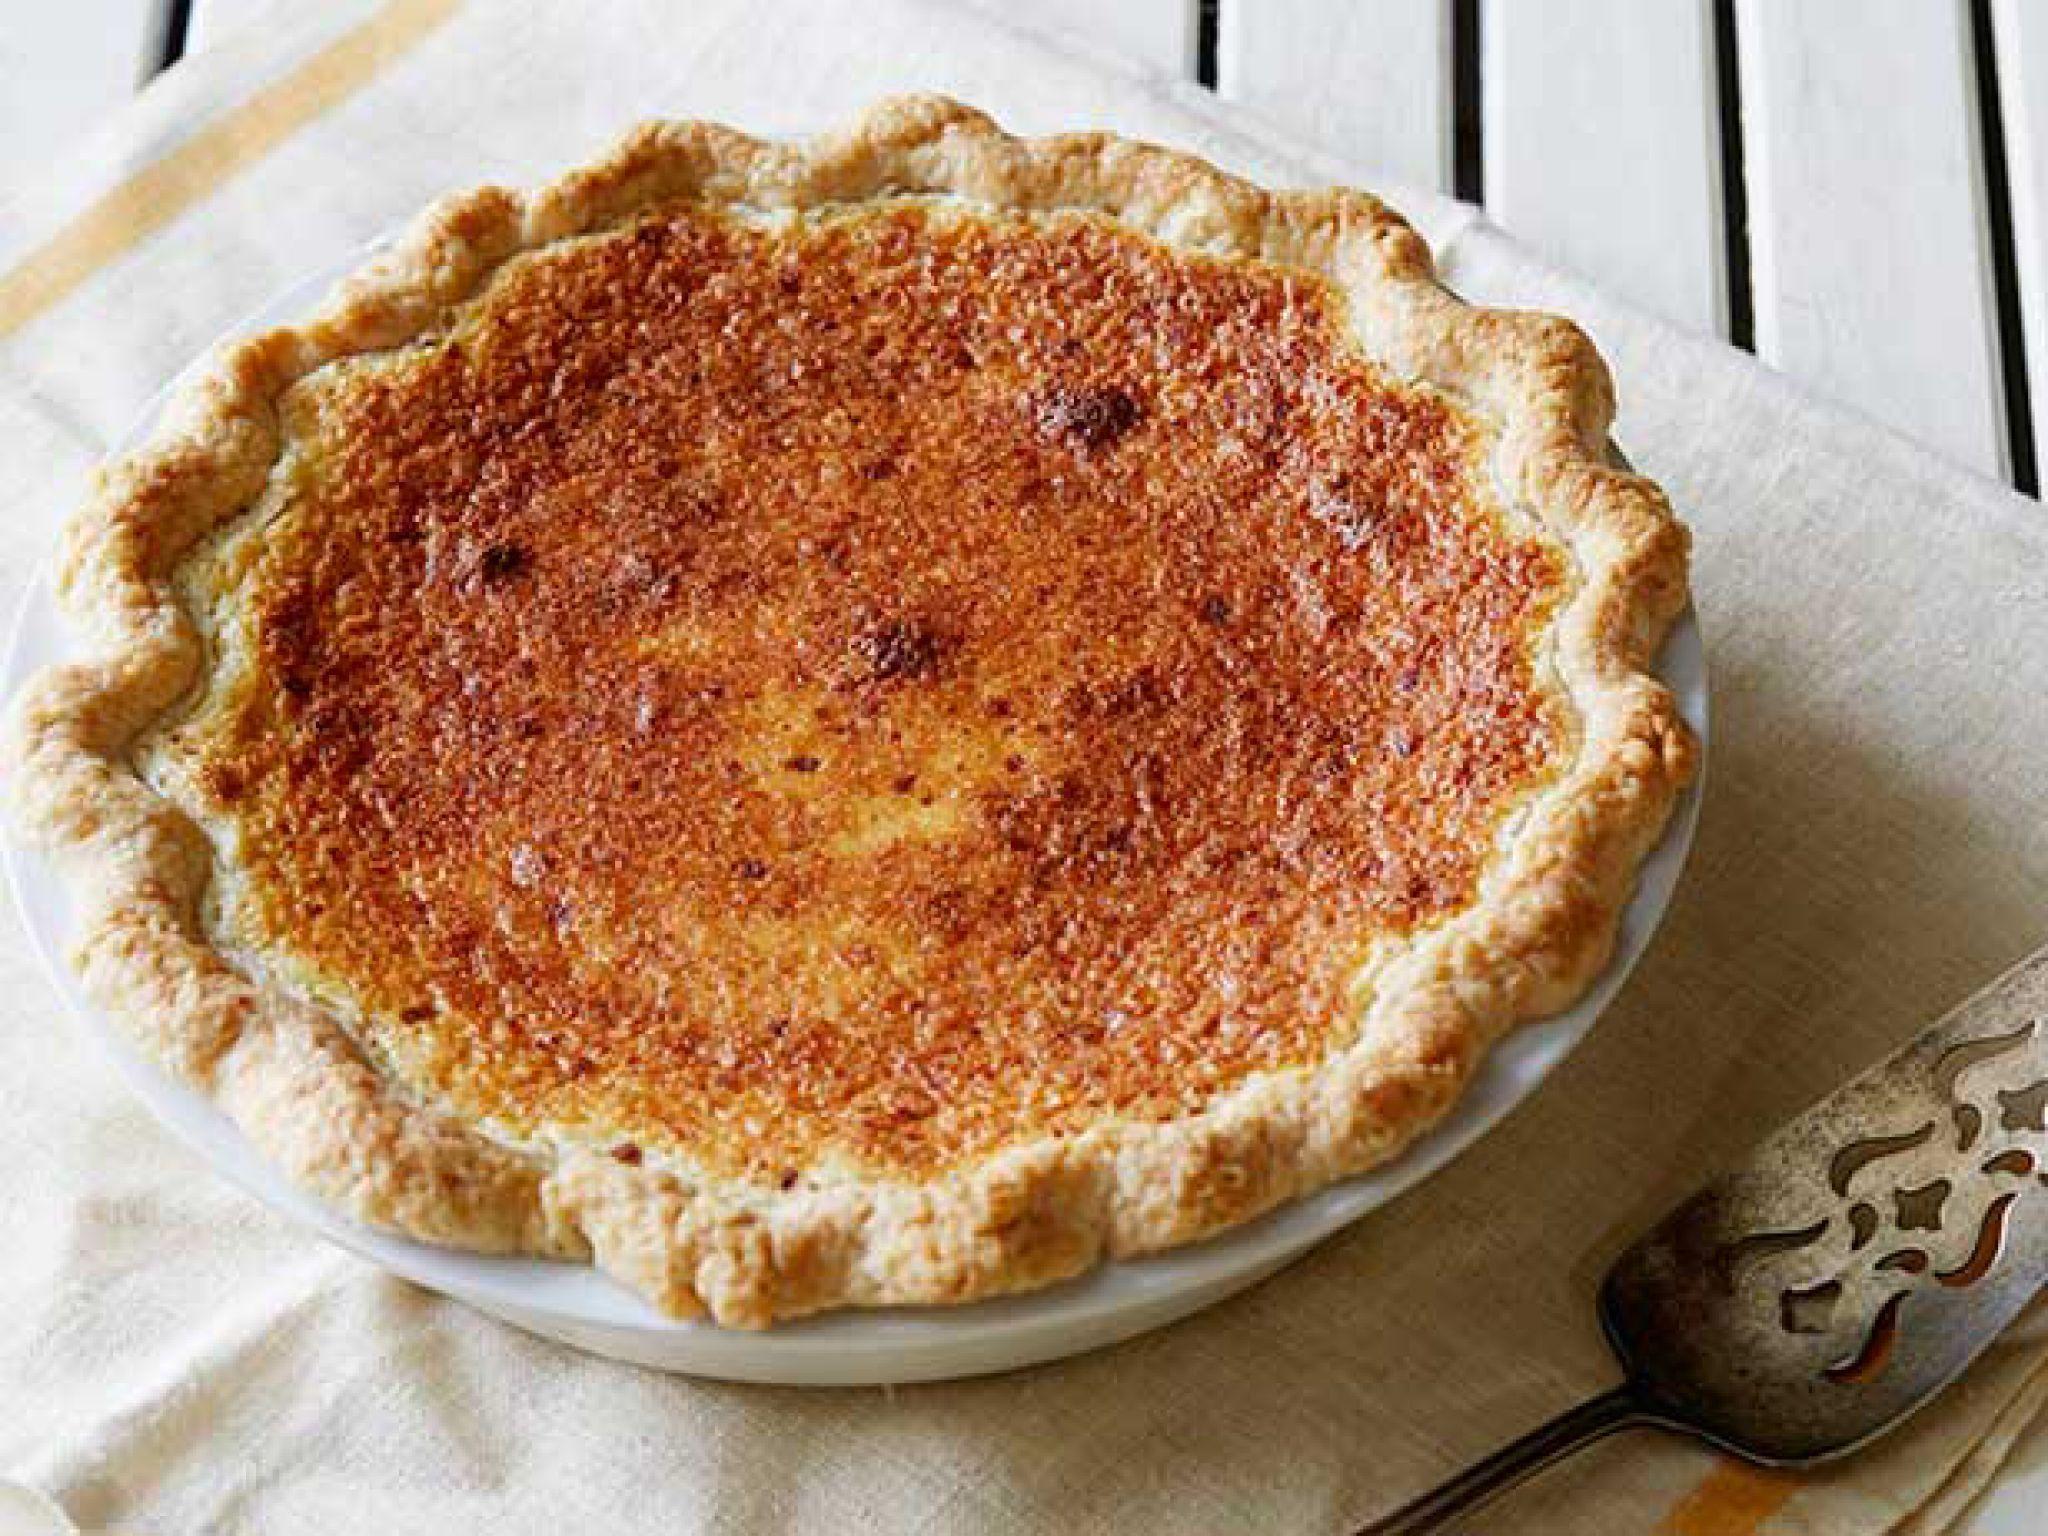 Buttermilk Pie Recipe Buttermilk Pie Recipe Buttermilk Pie Food Network Recipes